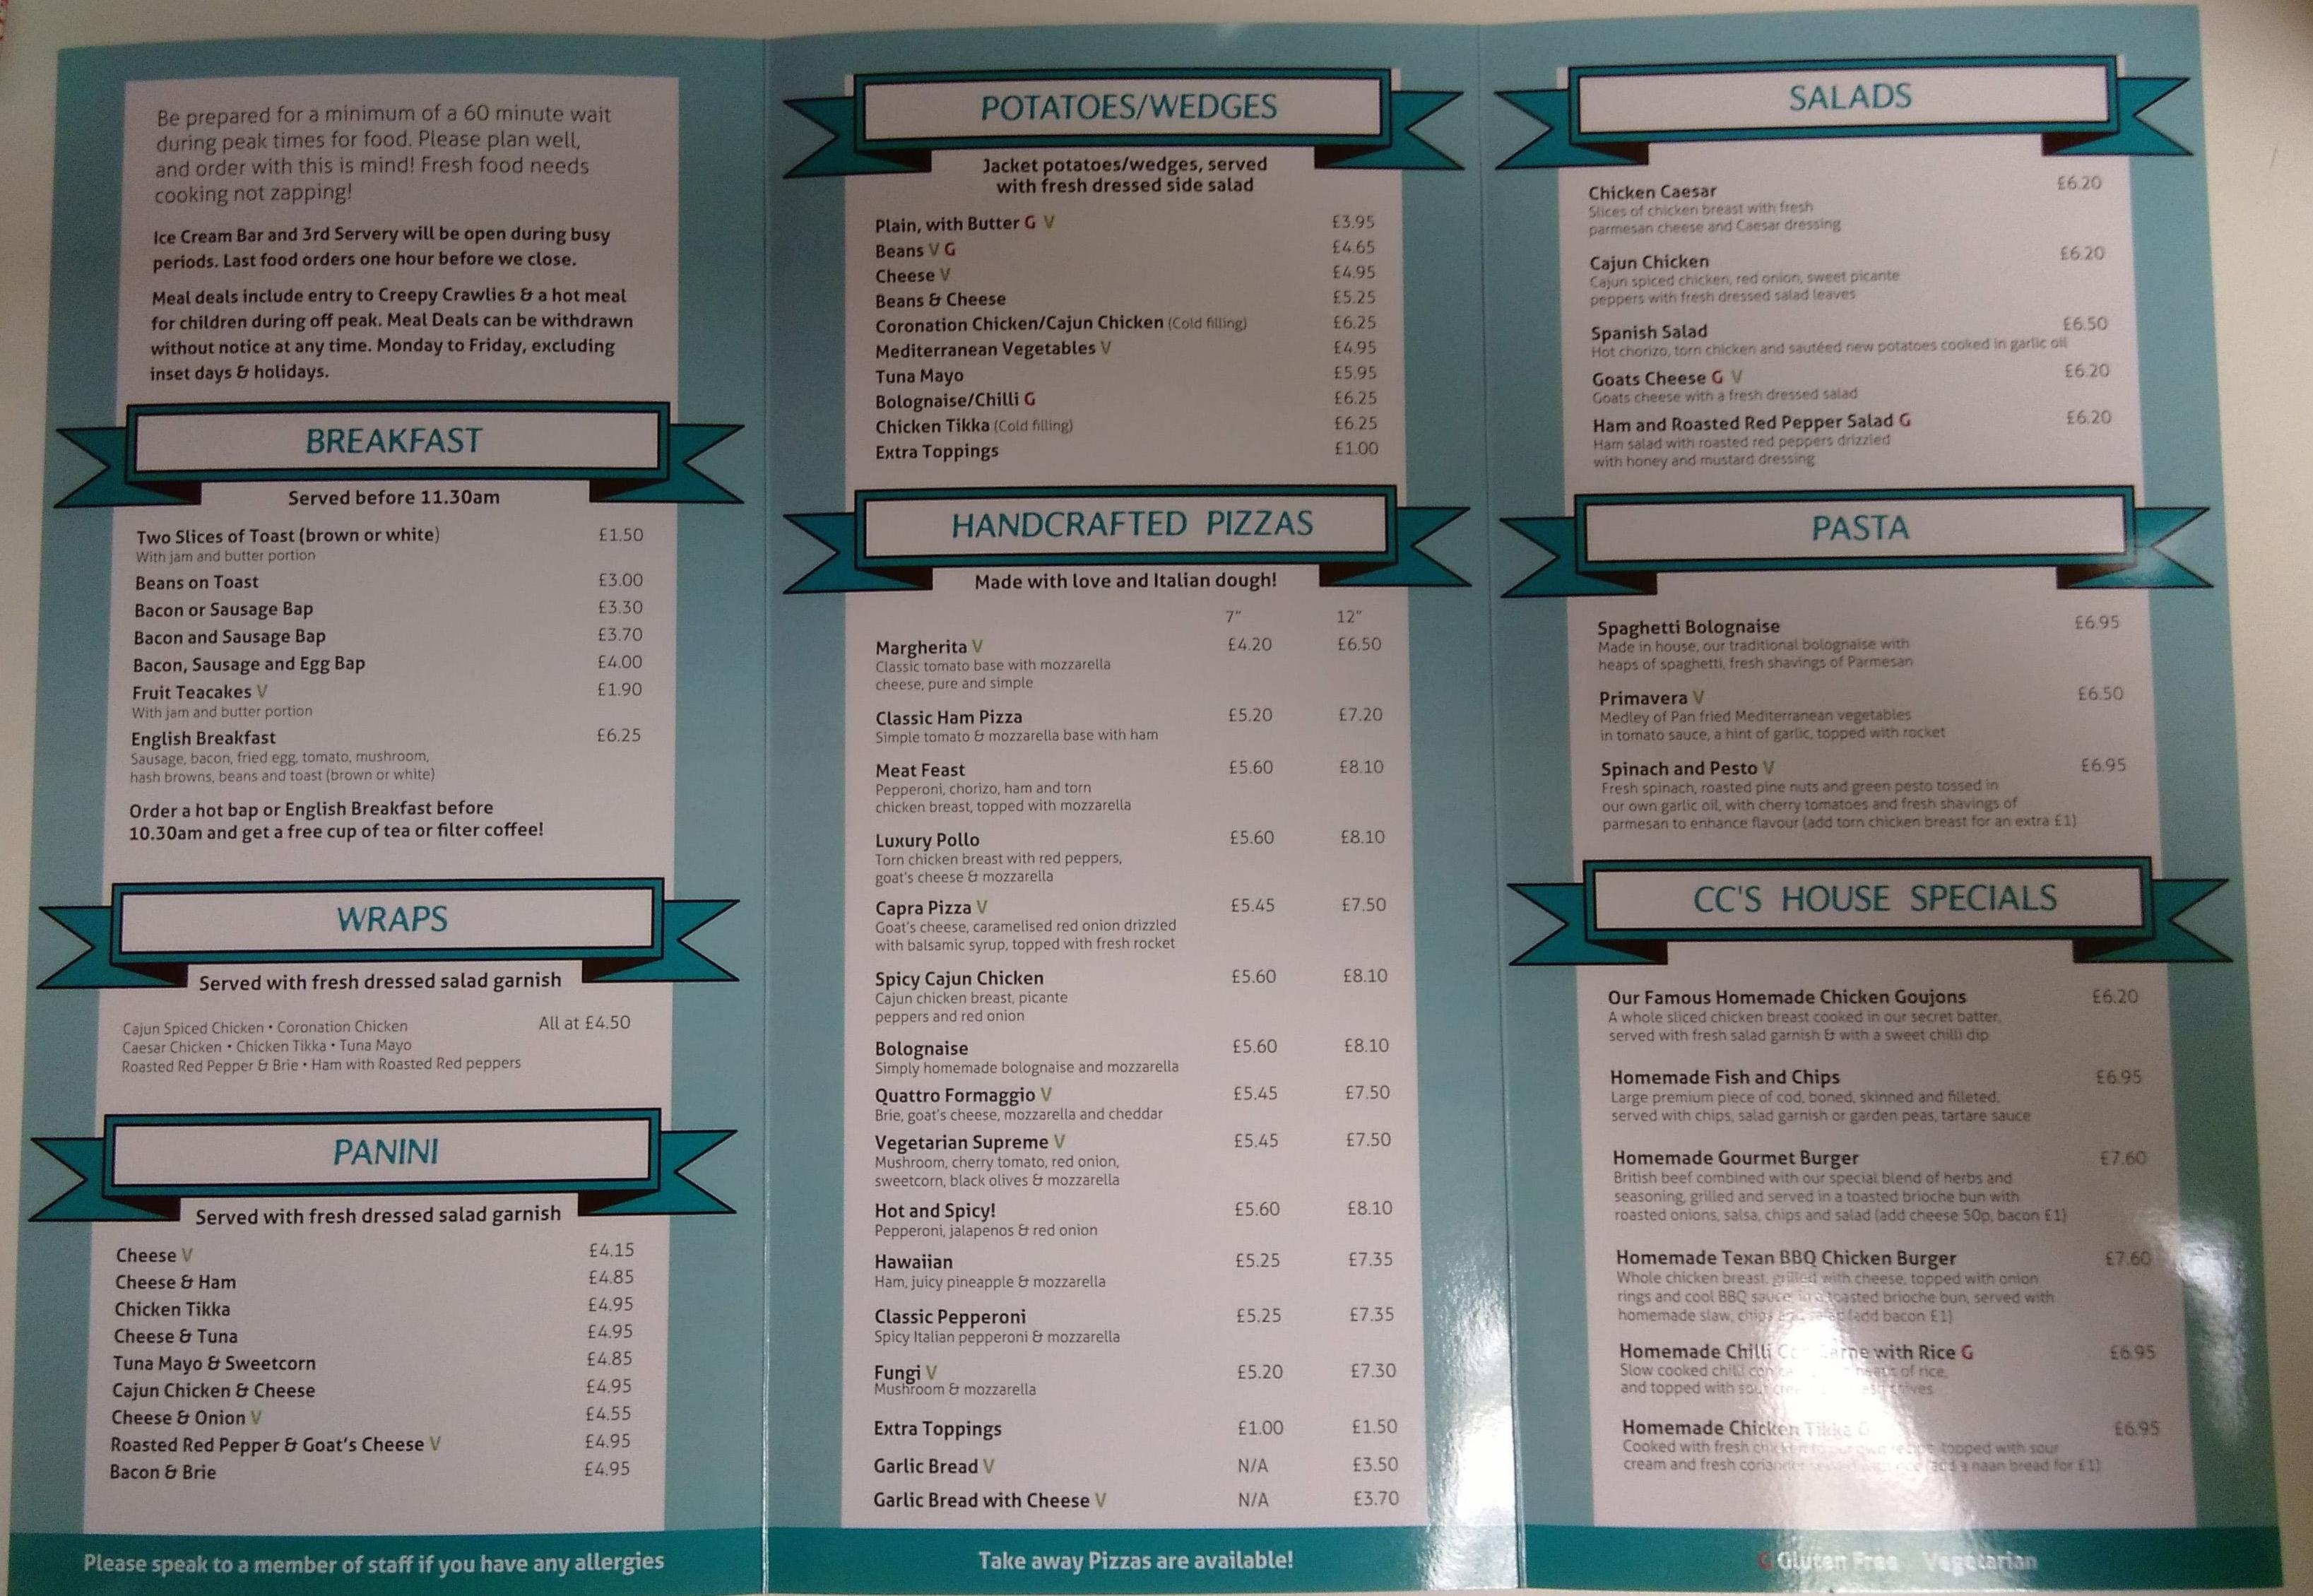 creepy crawlies menu back